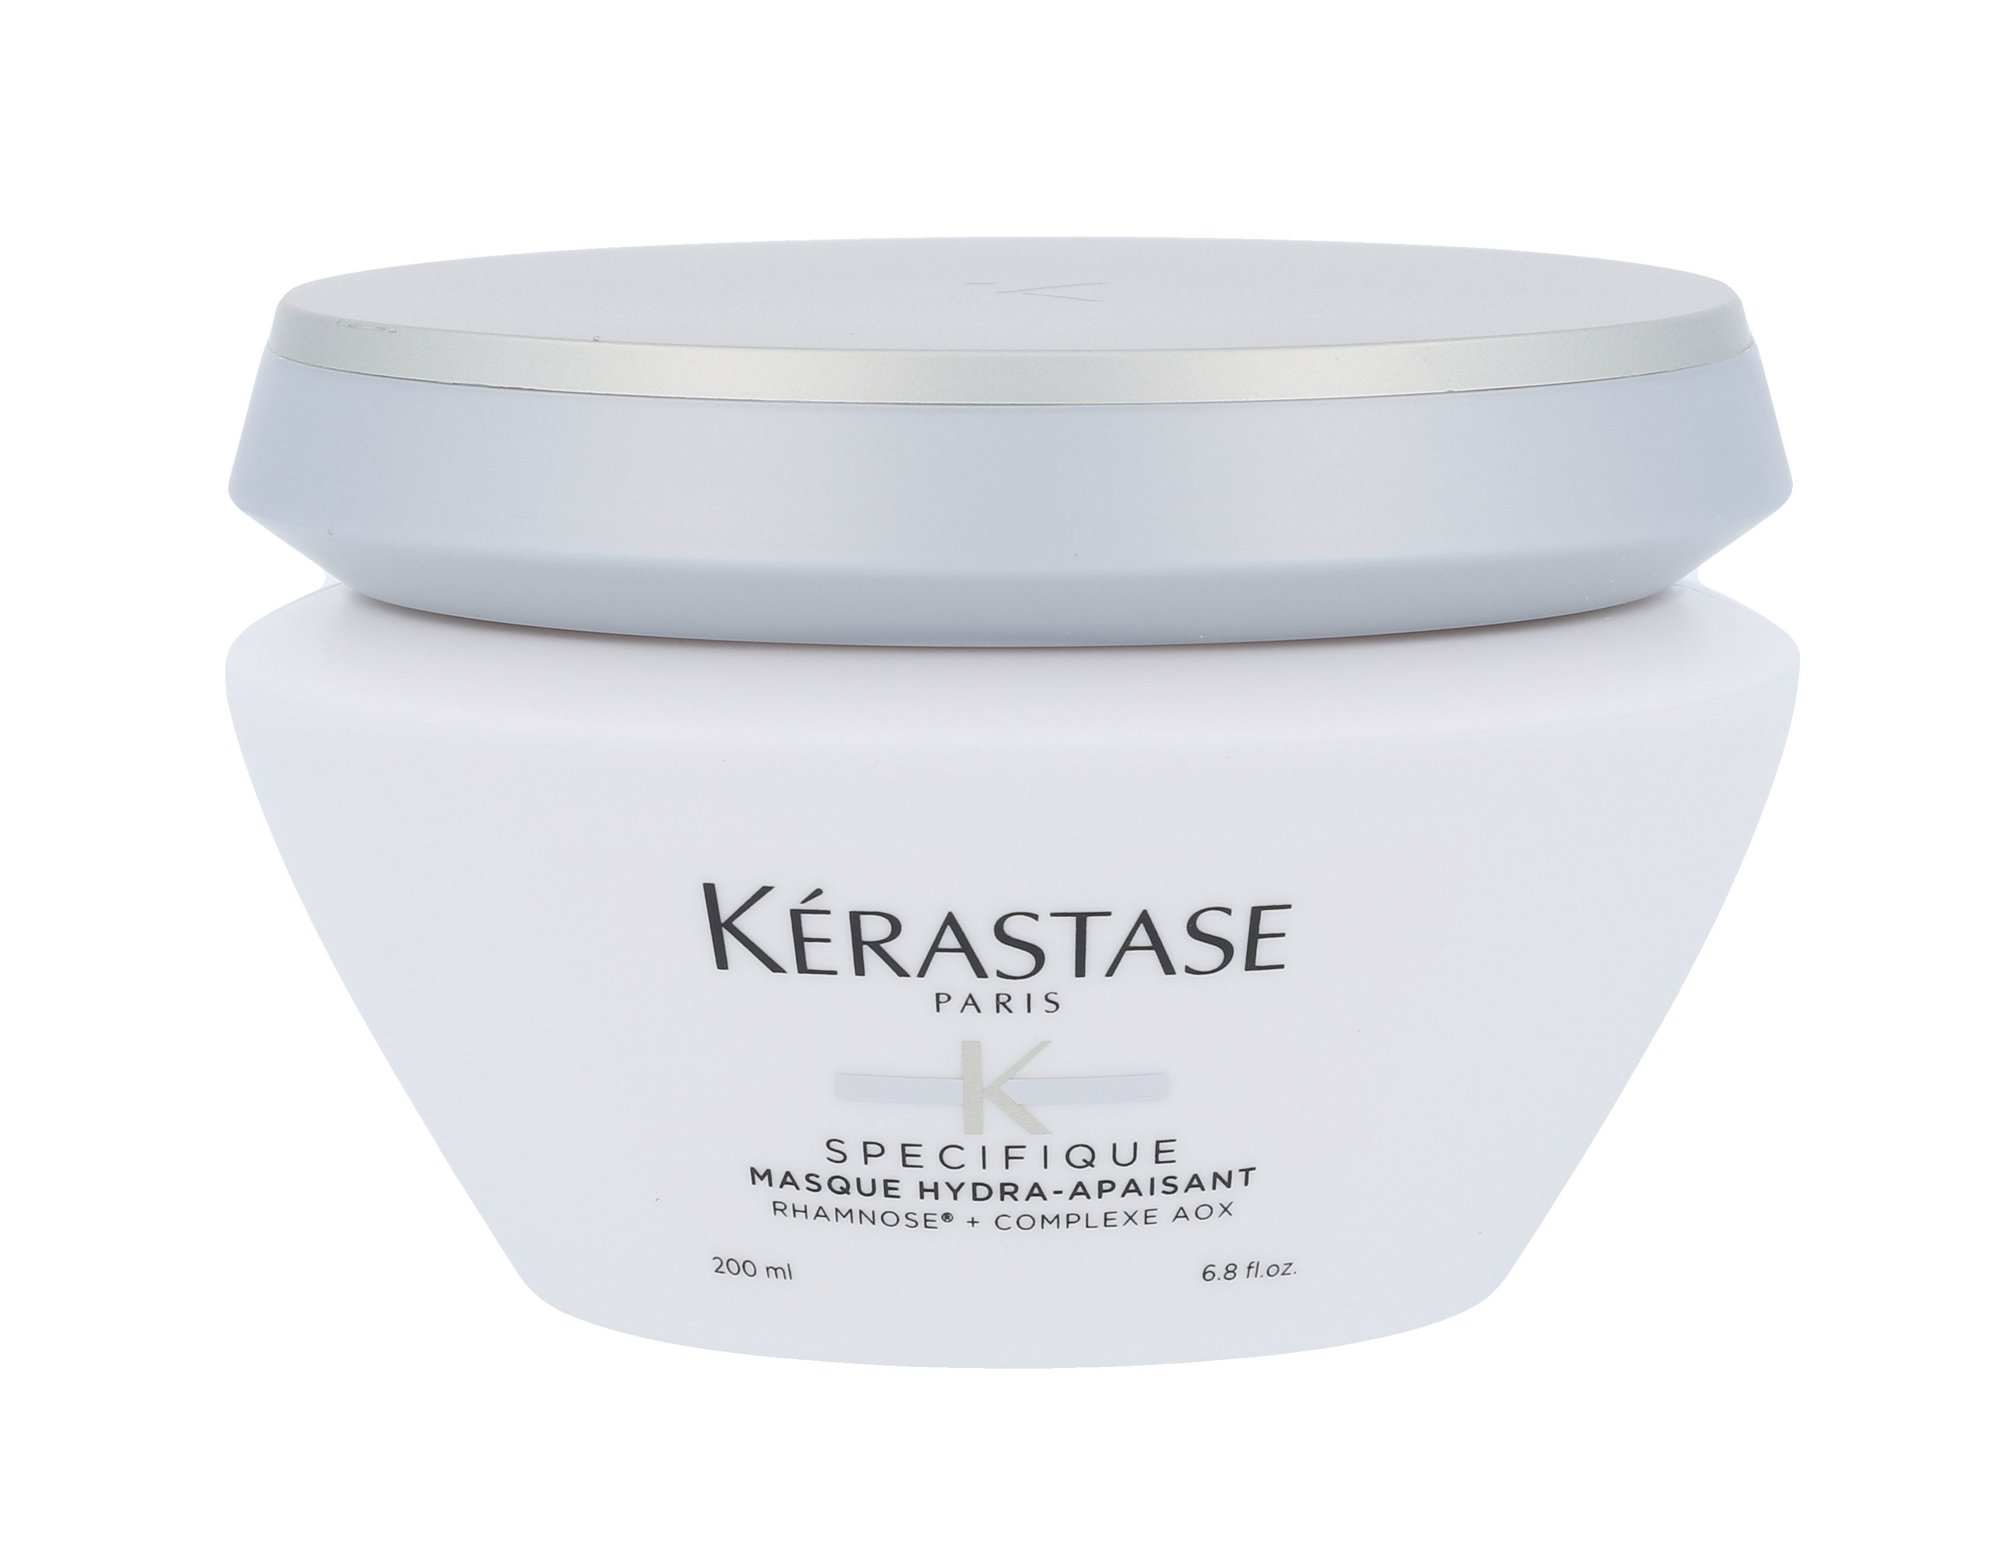 Kérastase Spécifique Cosmetic 200ml